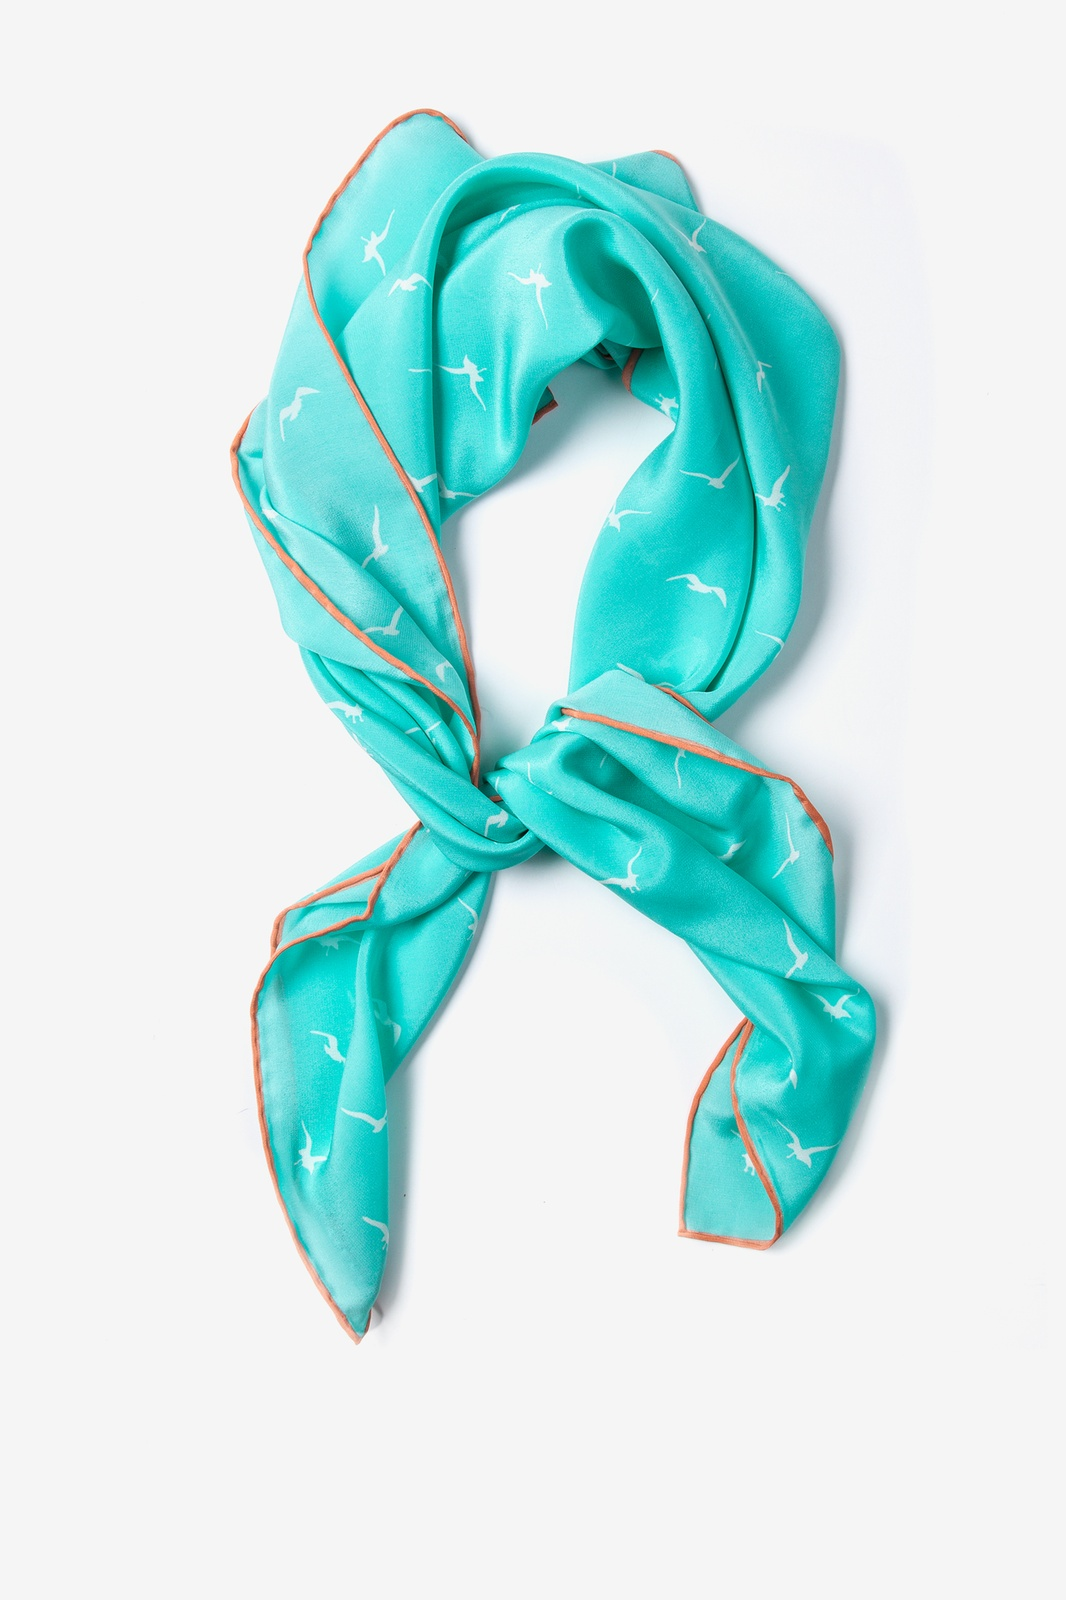 aqua-silk-seagull-silhouettes-square-scarf-238109-105-1600-0.jpg